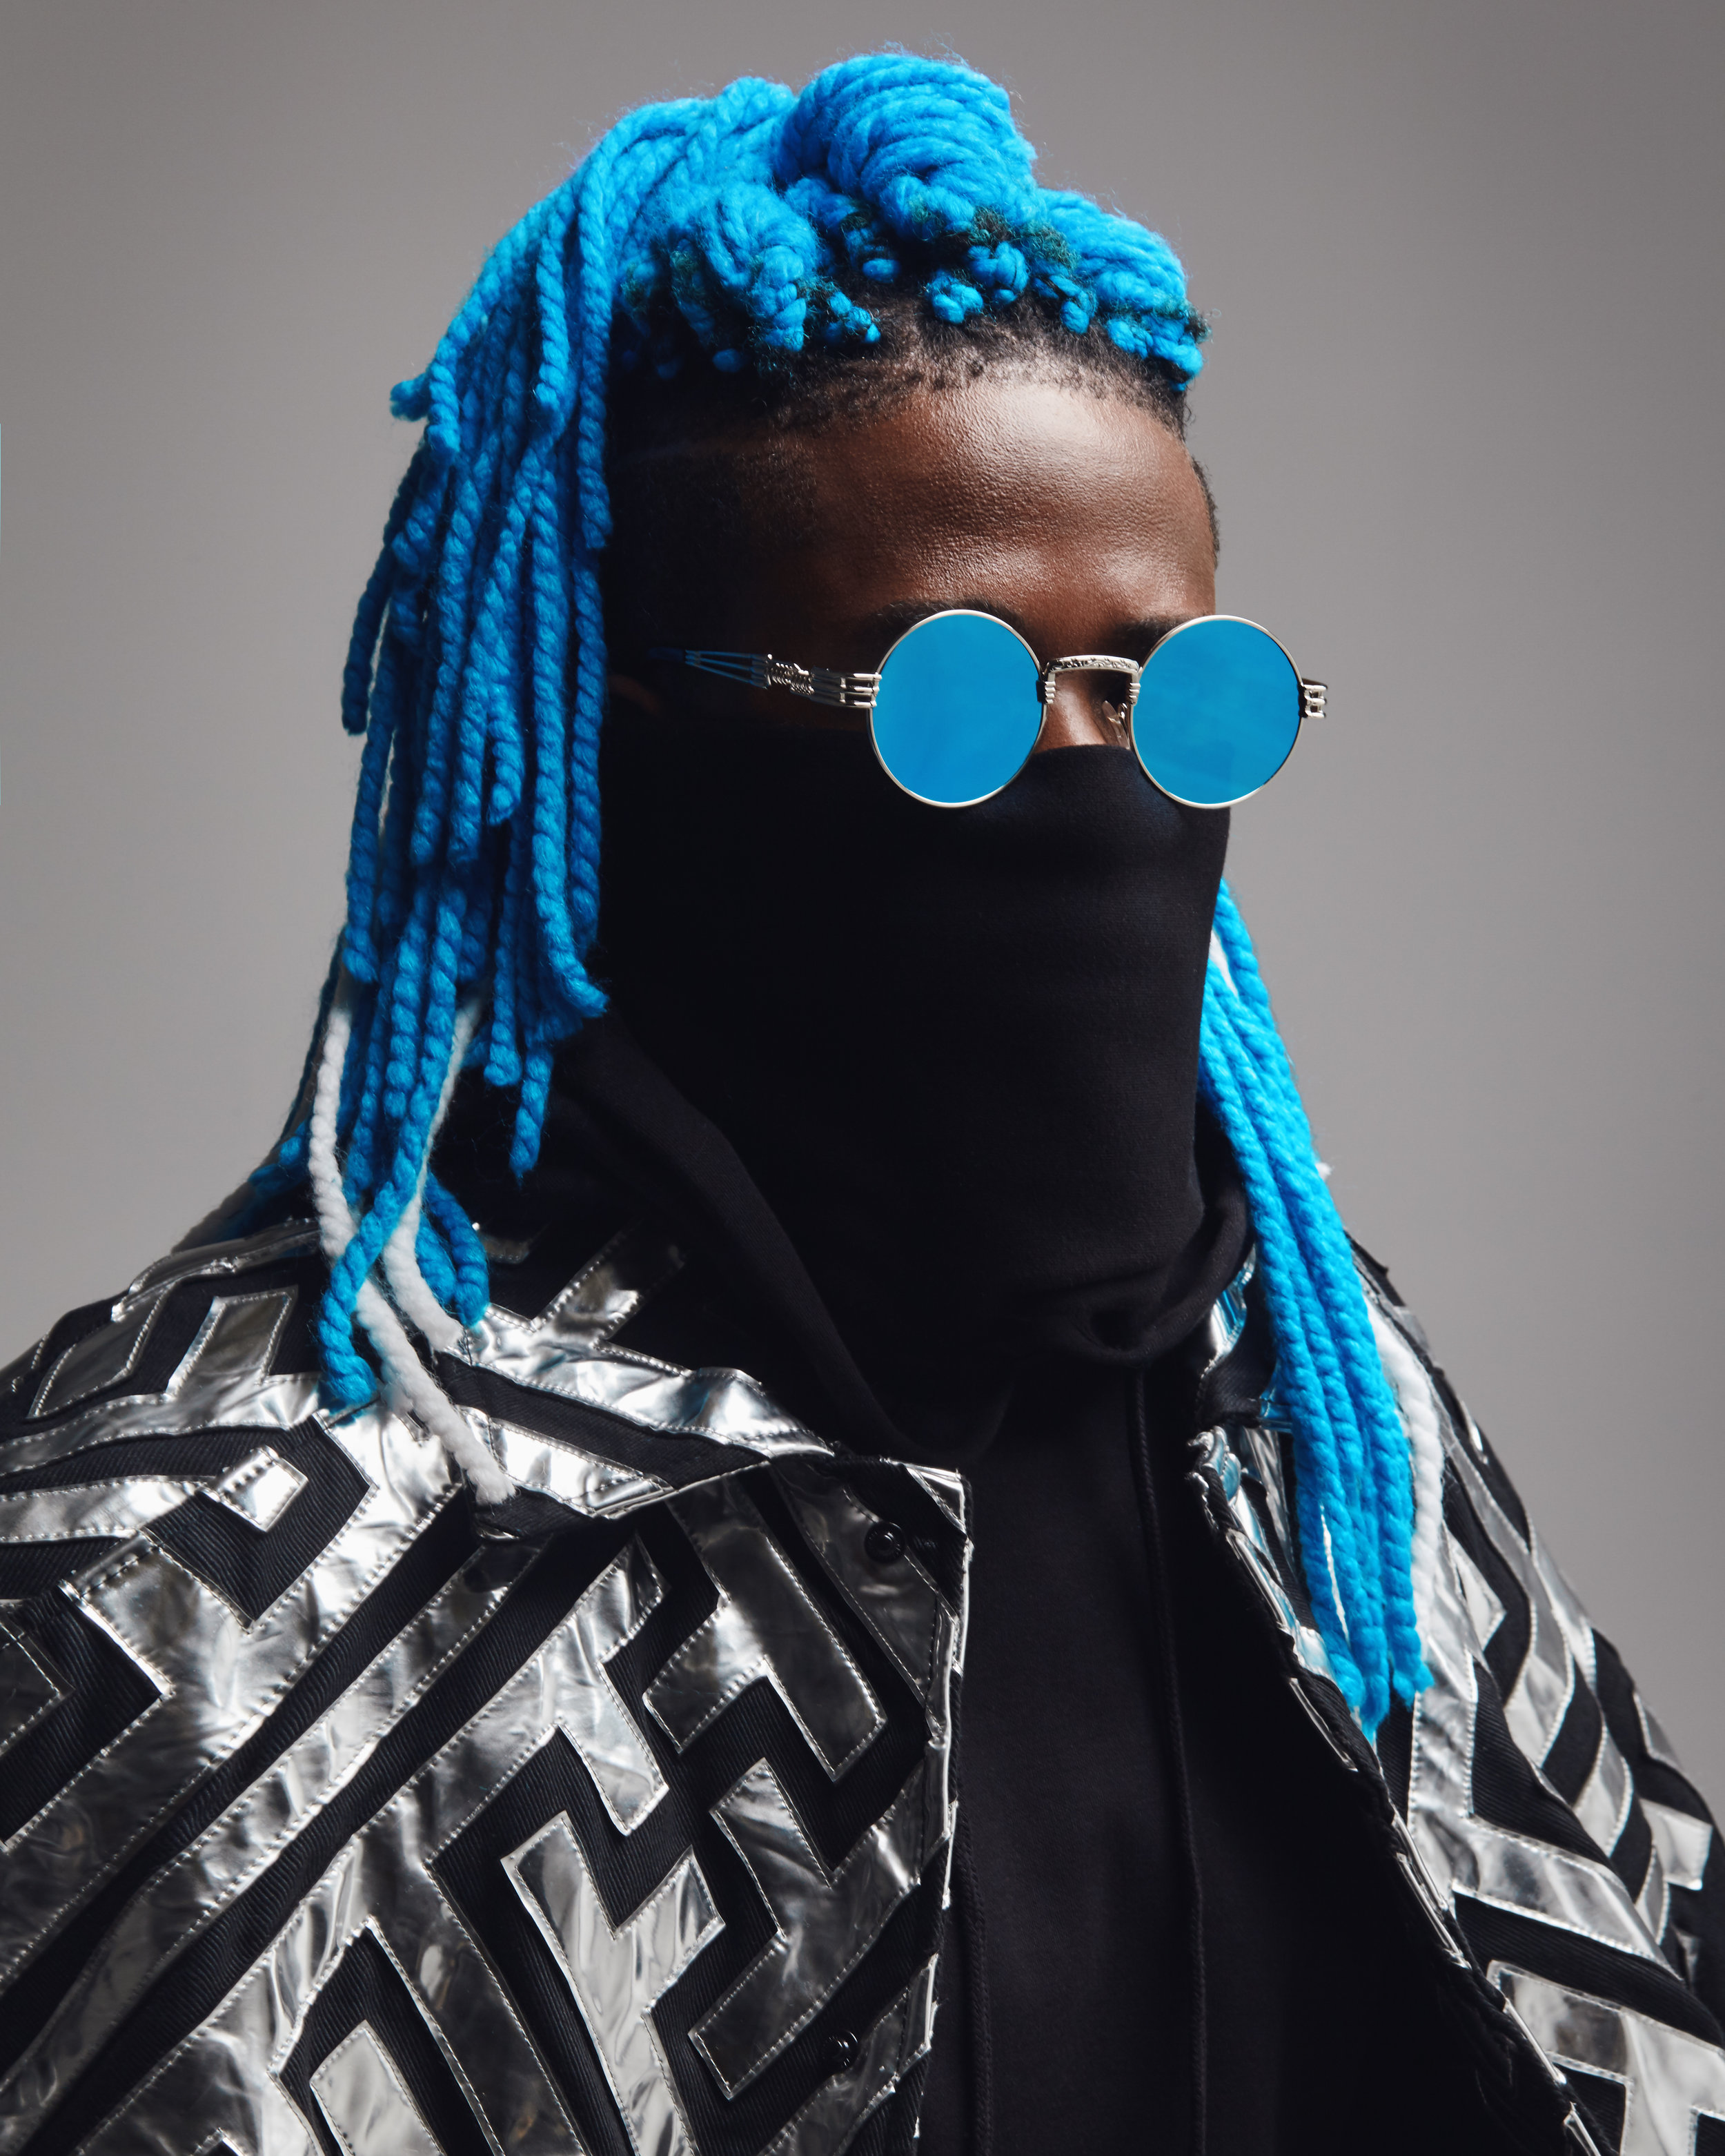 DJ Bluey